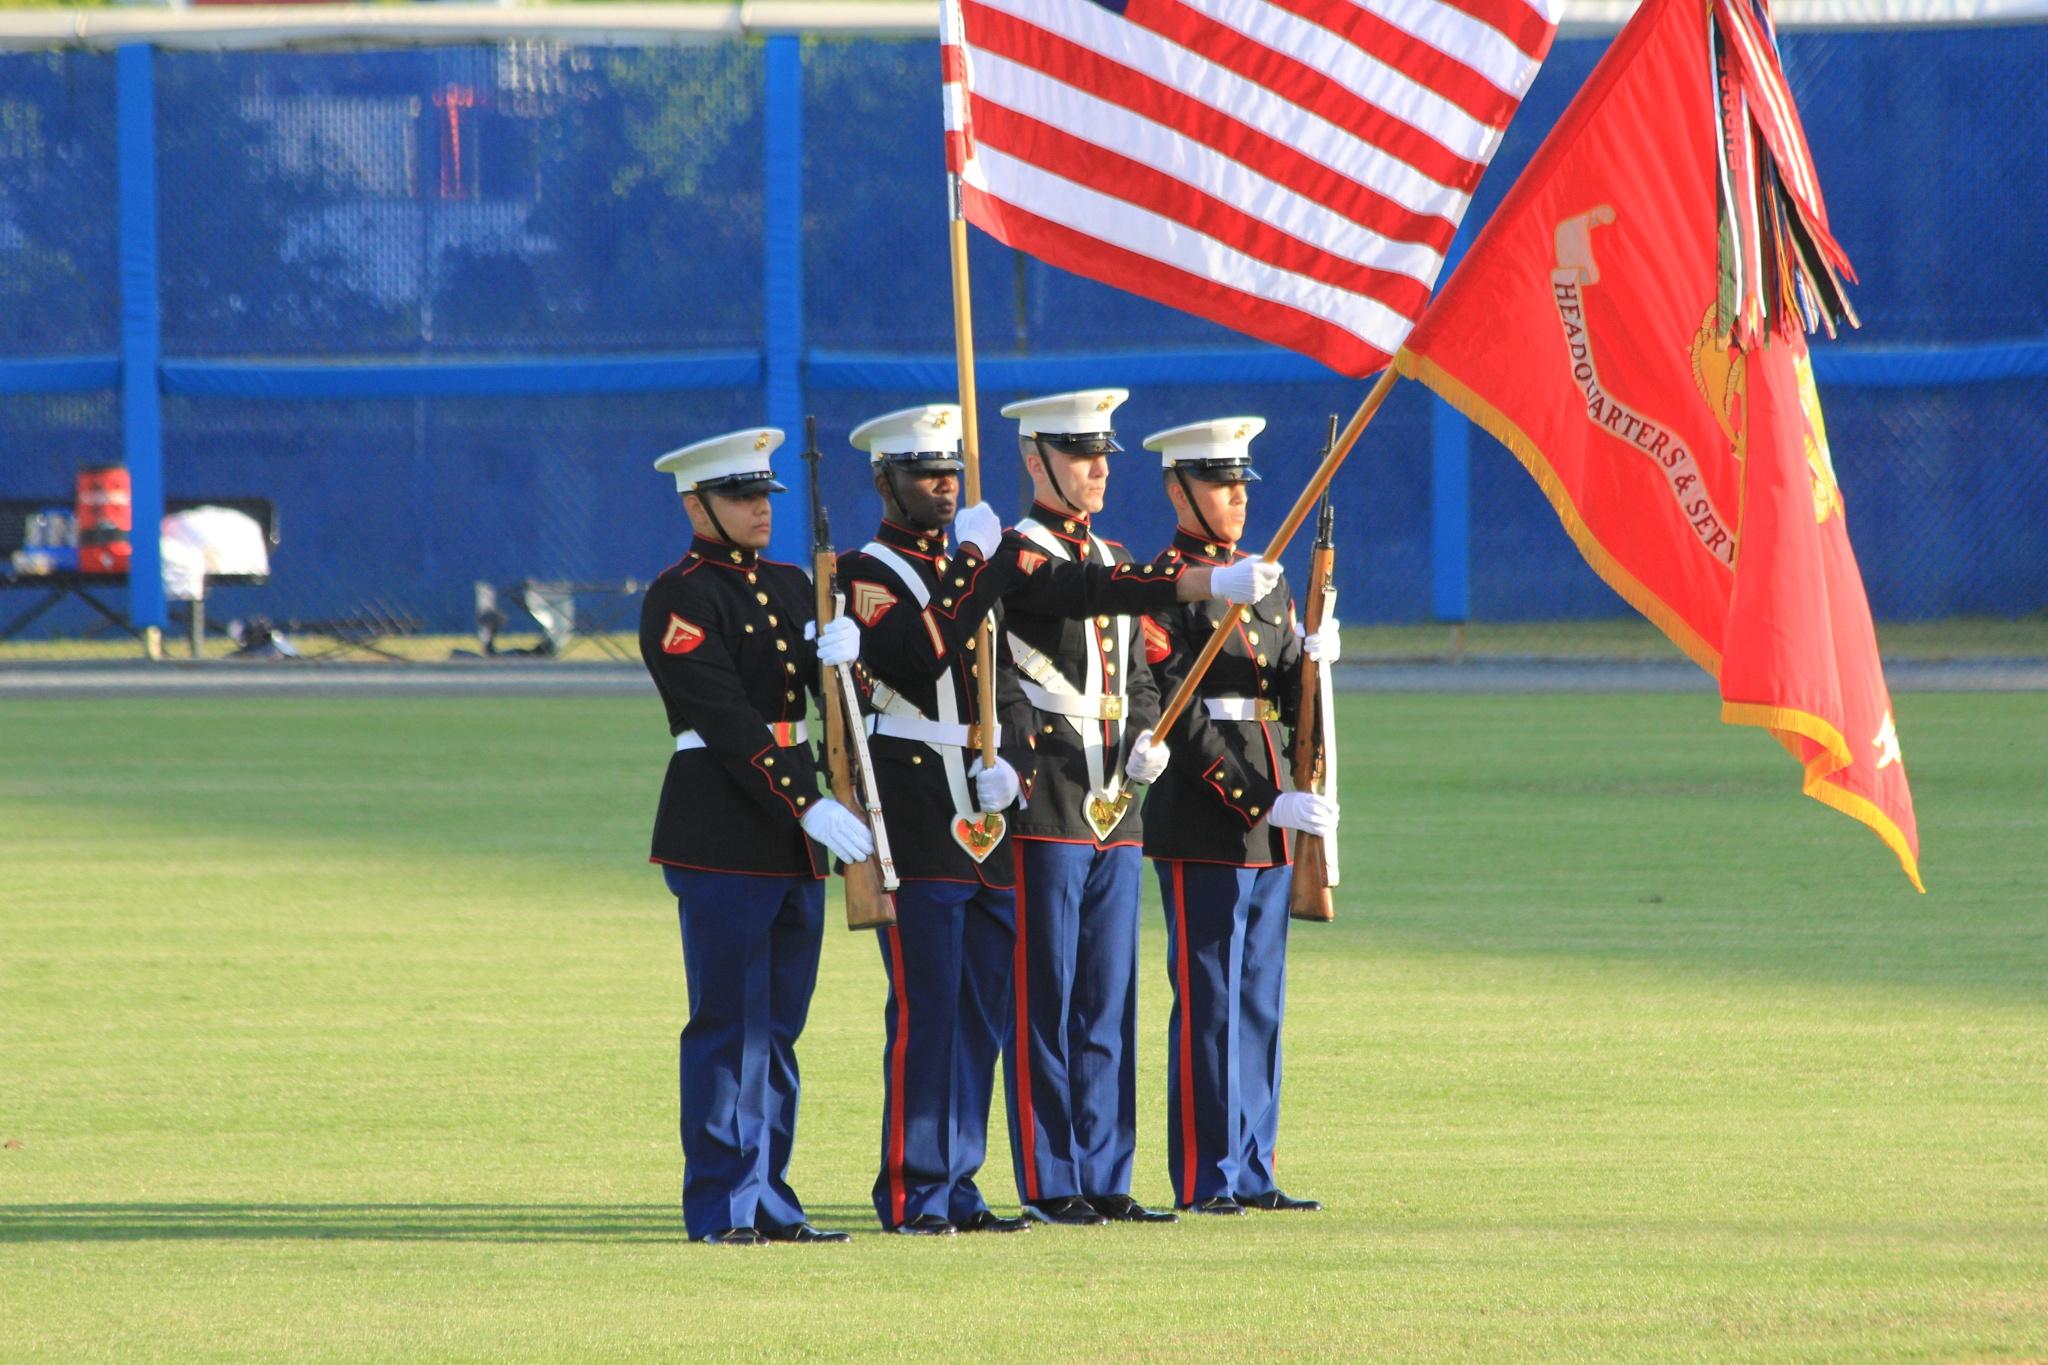 U.S. Marines by daniellsmithjr